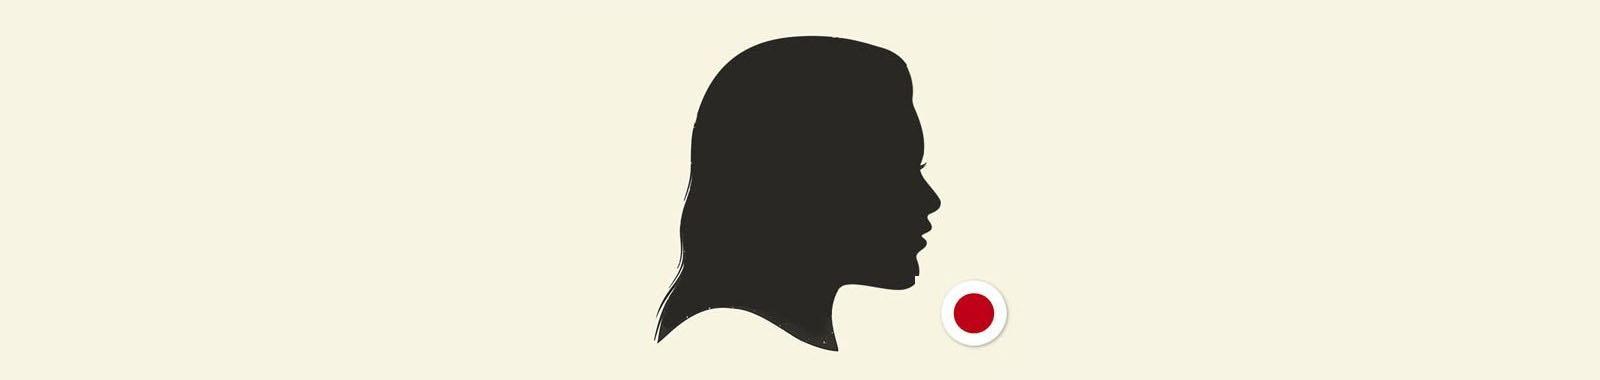 confessions_woman-jp-eye